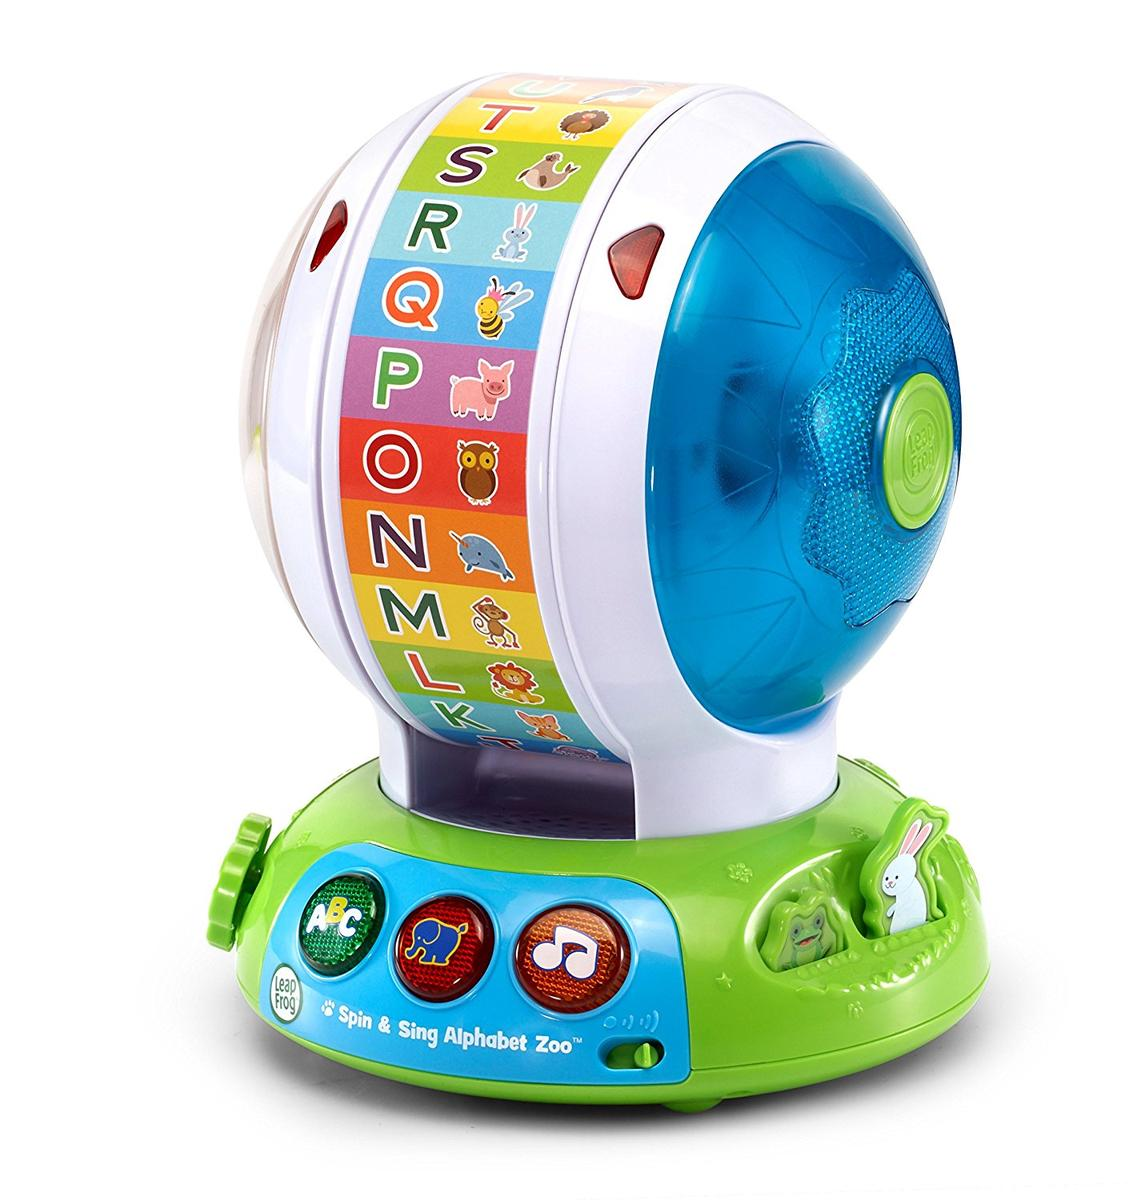 LeapFrog アルファベット 学習 おもちゃ アルファベット動物園 海外 子供 幼児 知育玩具